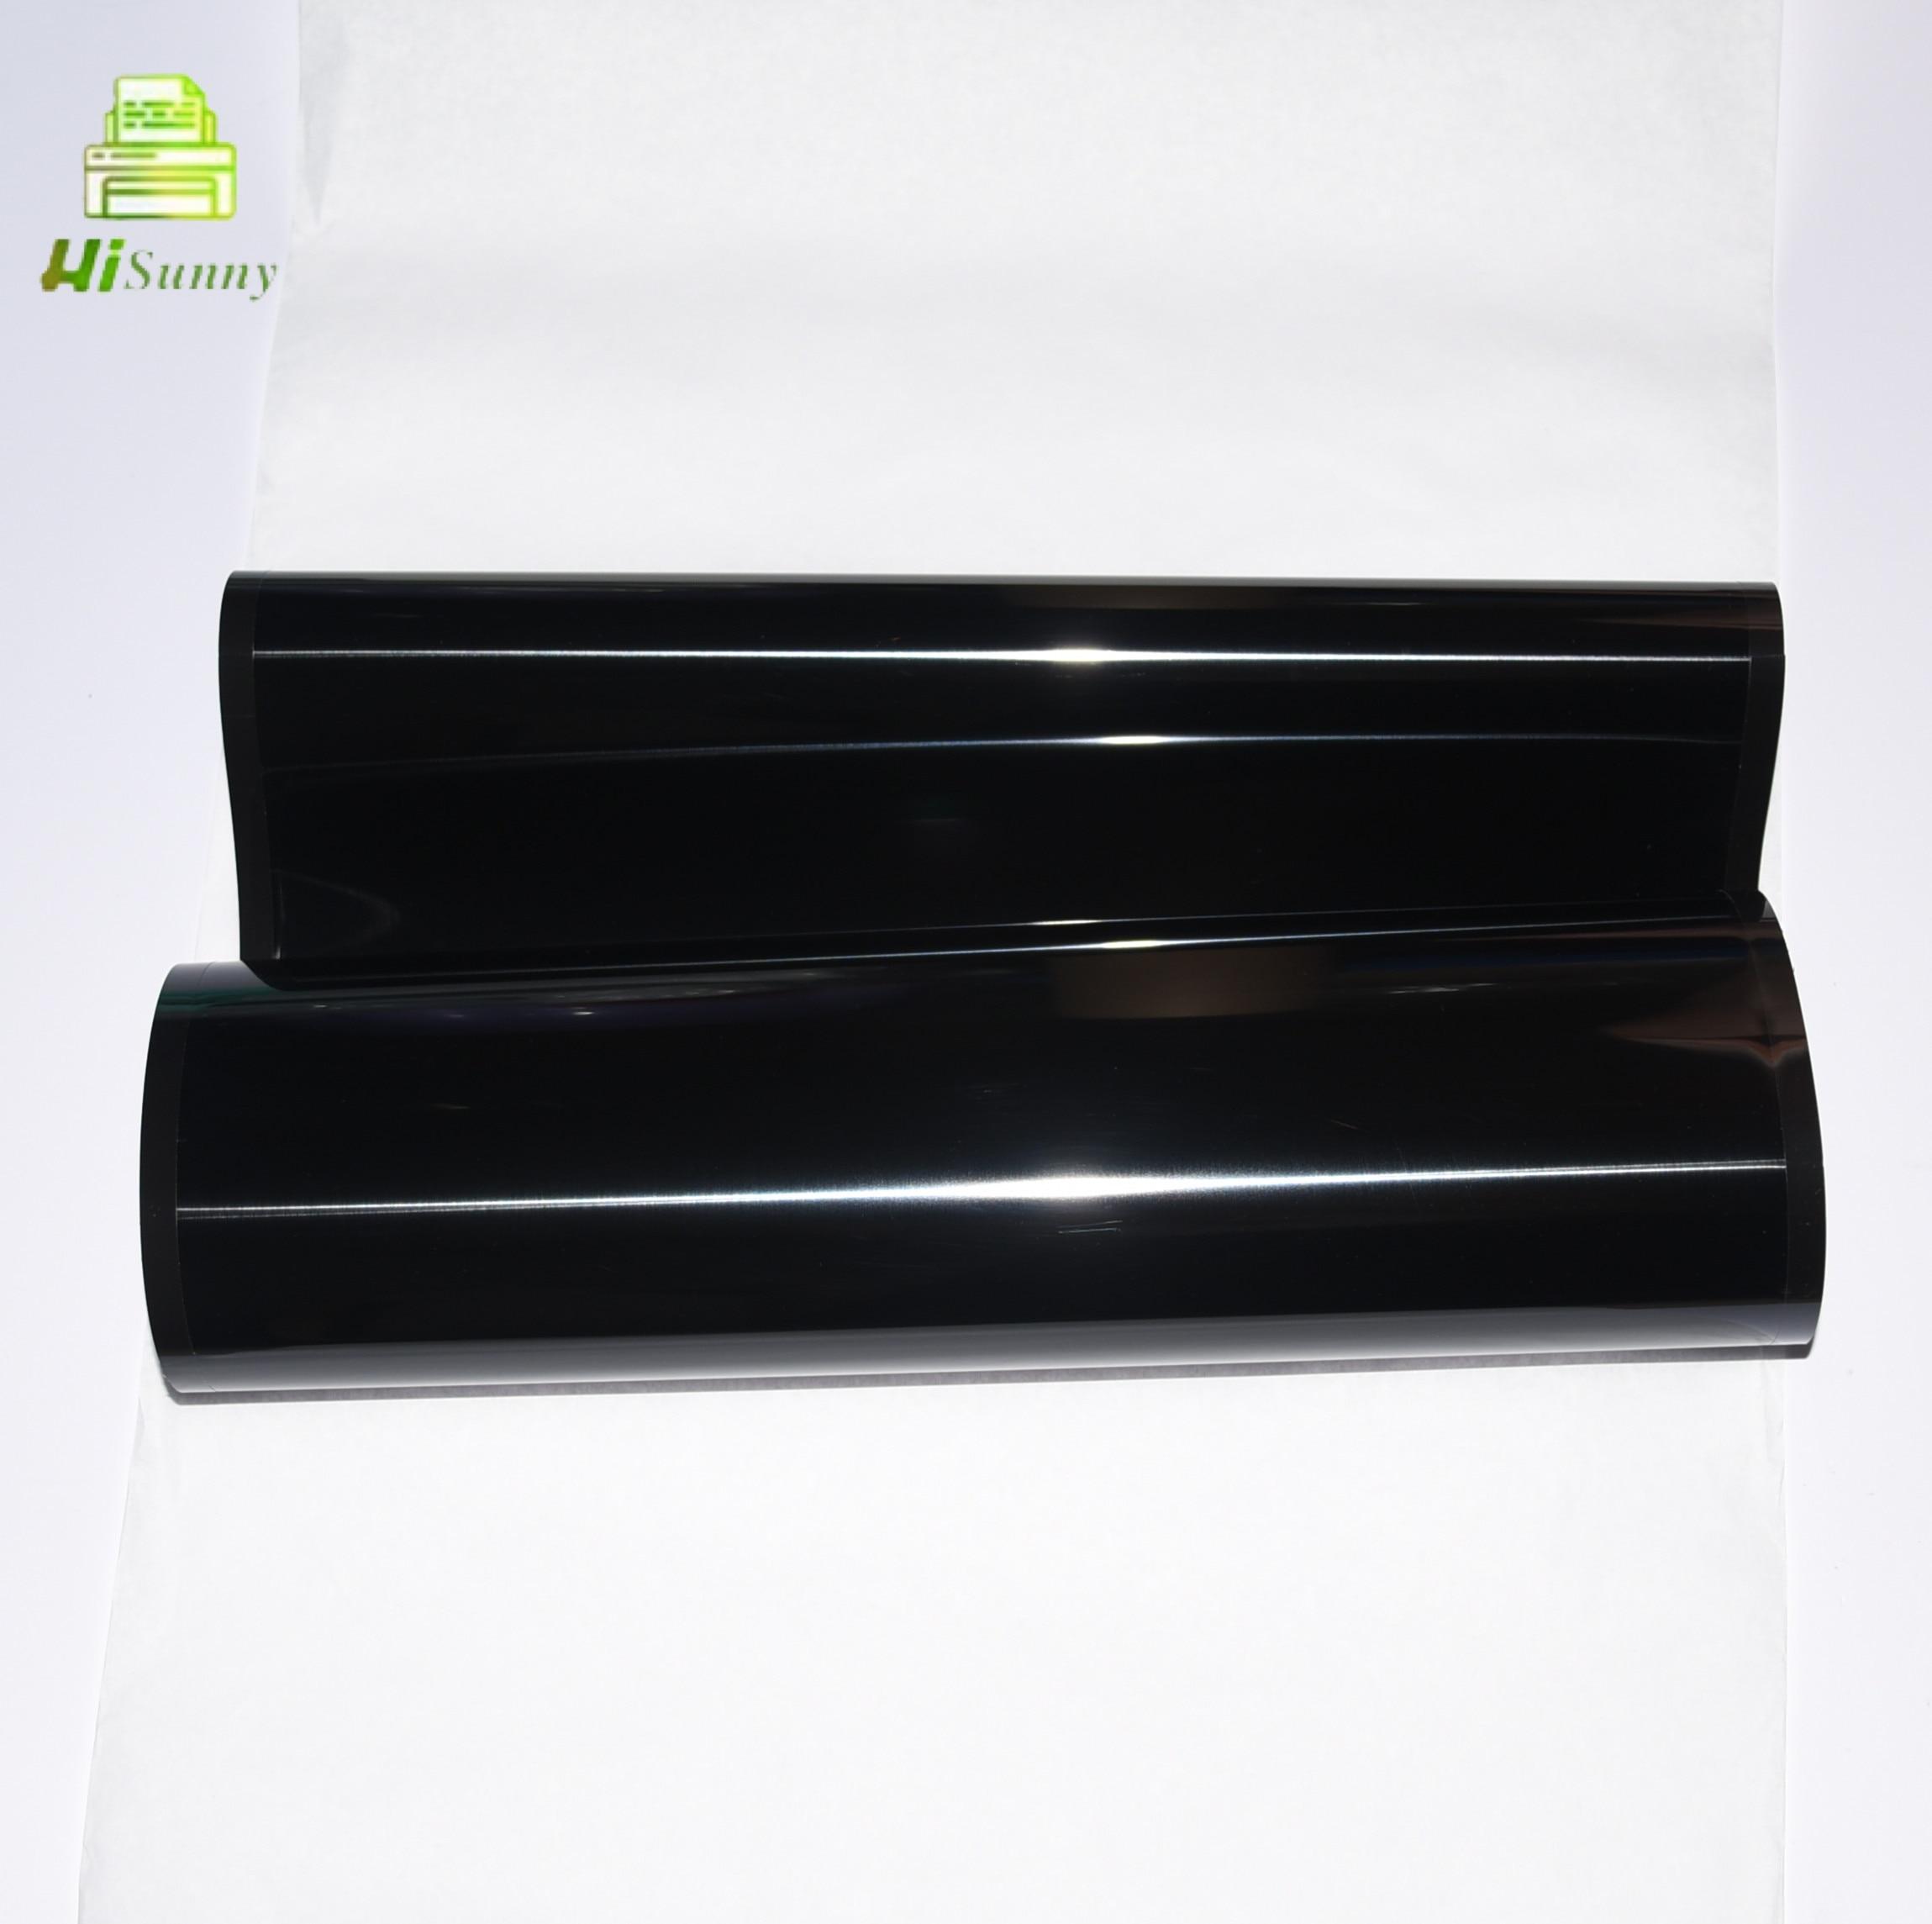 DC240 IBT Transfer Belt + Blade For Xerox 700 700i 770 240 242 250 252 260 7655 7665 7675 7755 7765 7775 550 560 570 675K72181